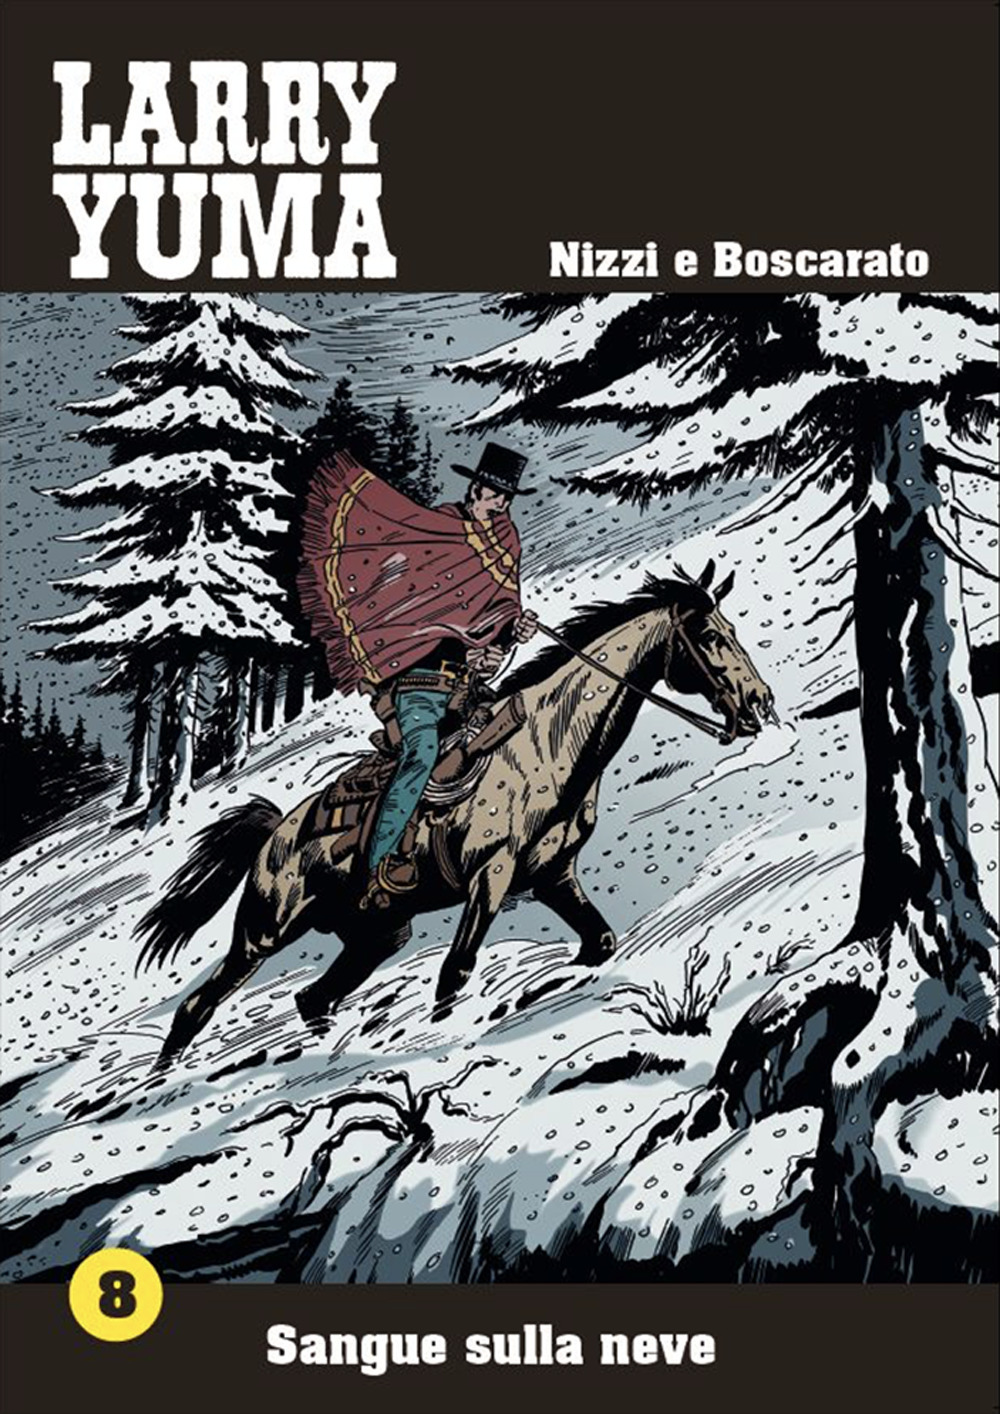 SANGUE SULLA NEVE. LARRY YUMA - vol. 8 - 9788896457375